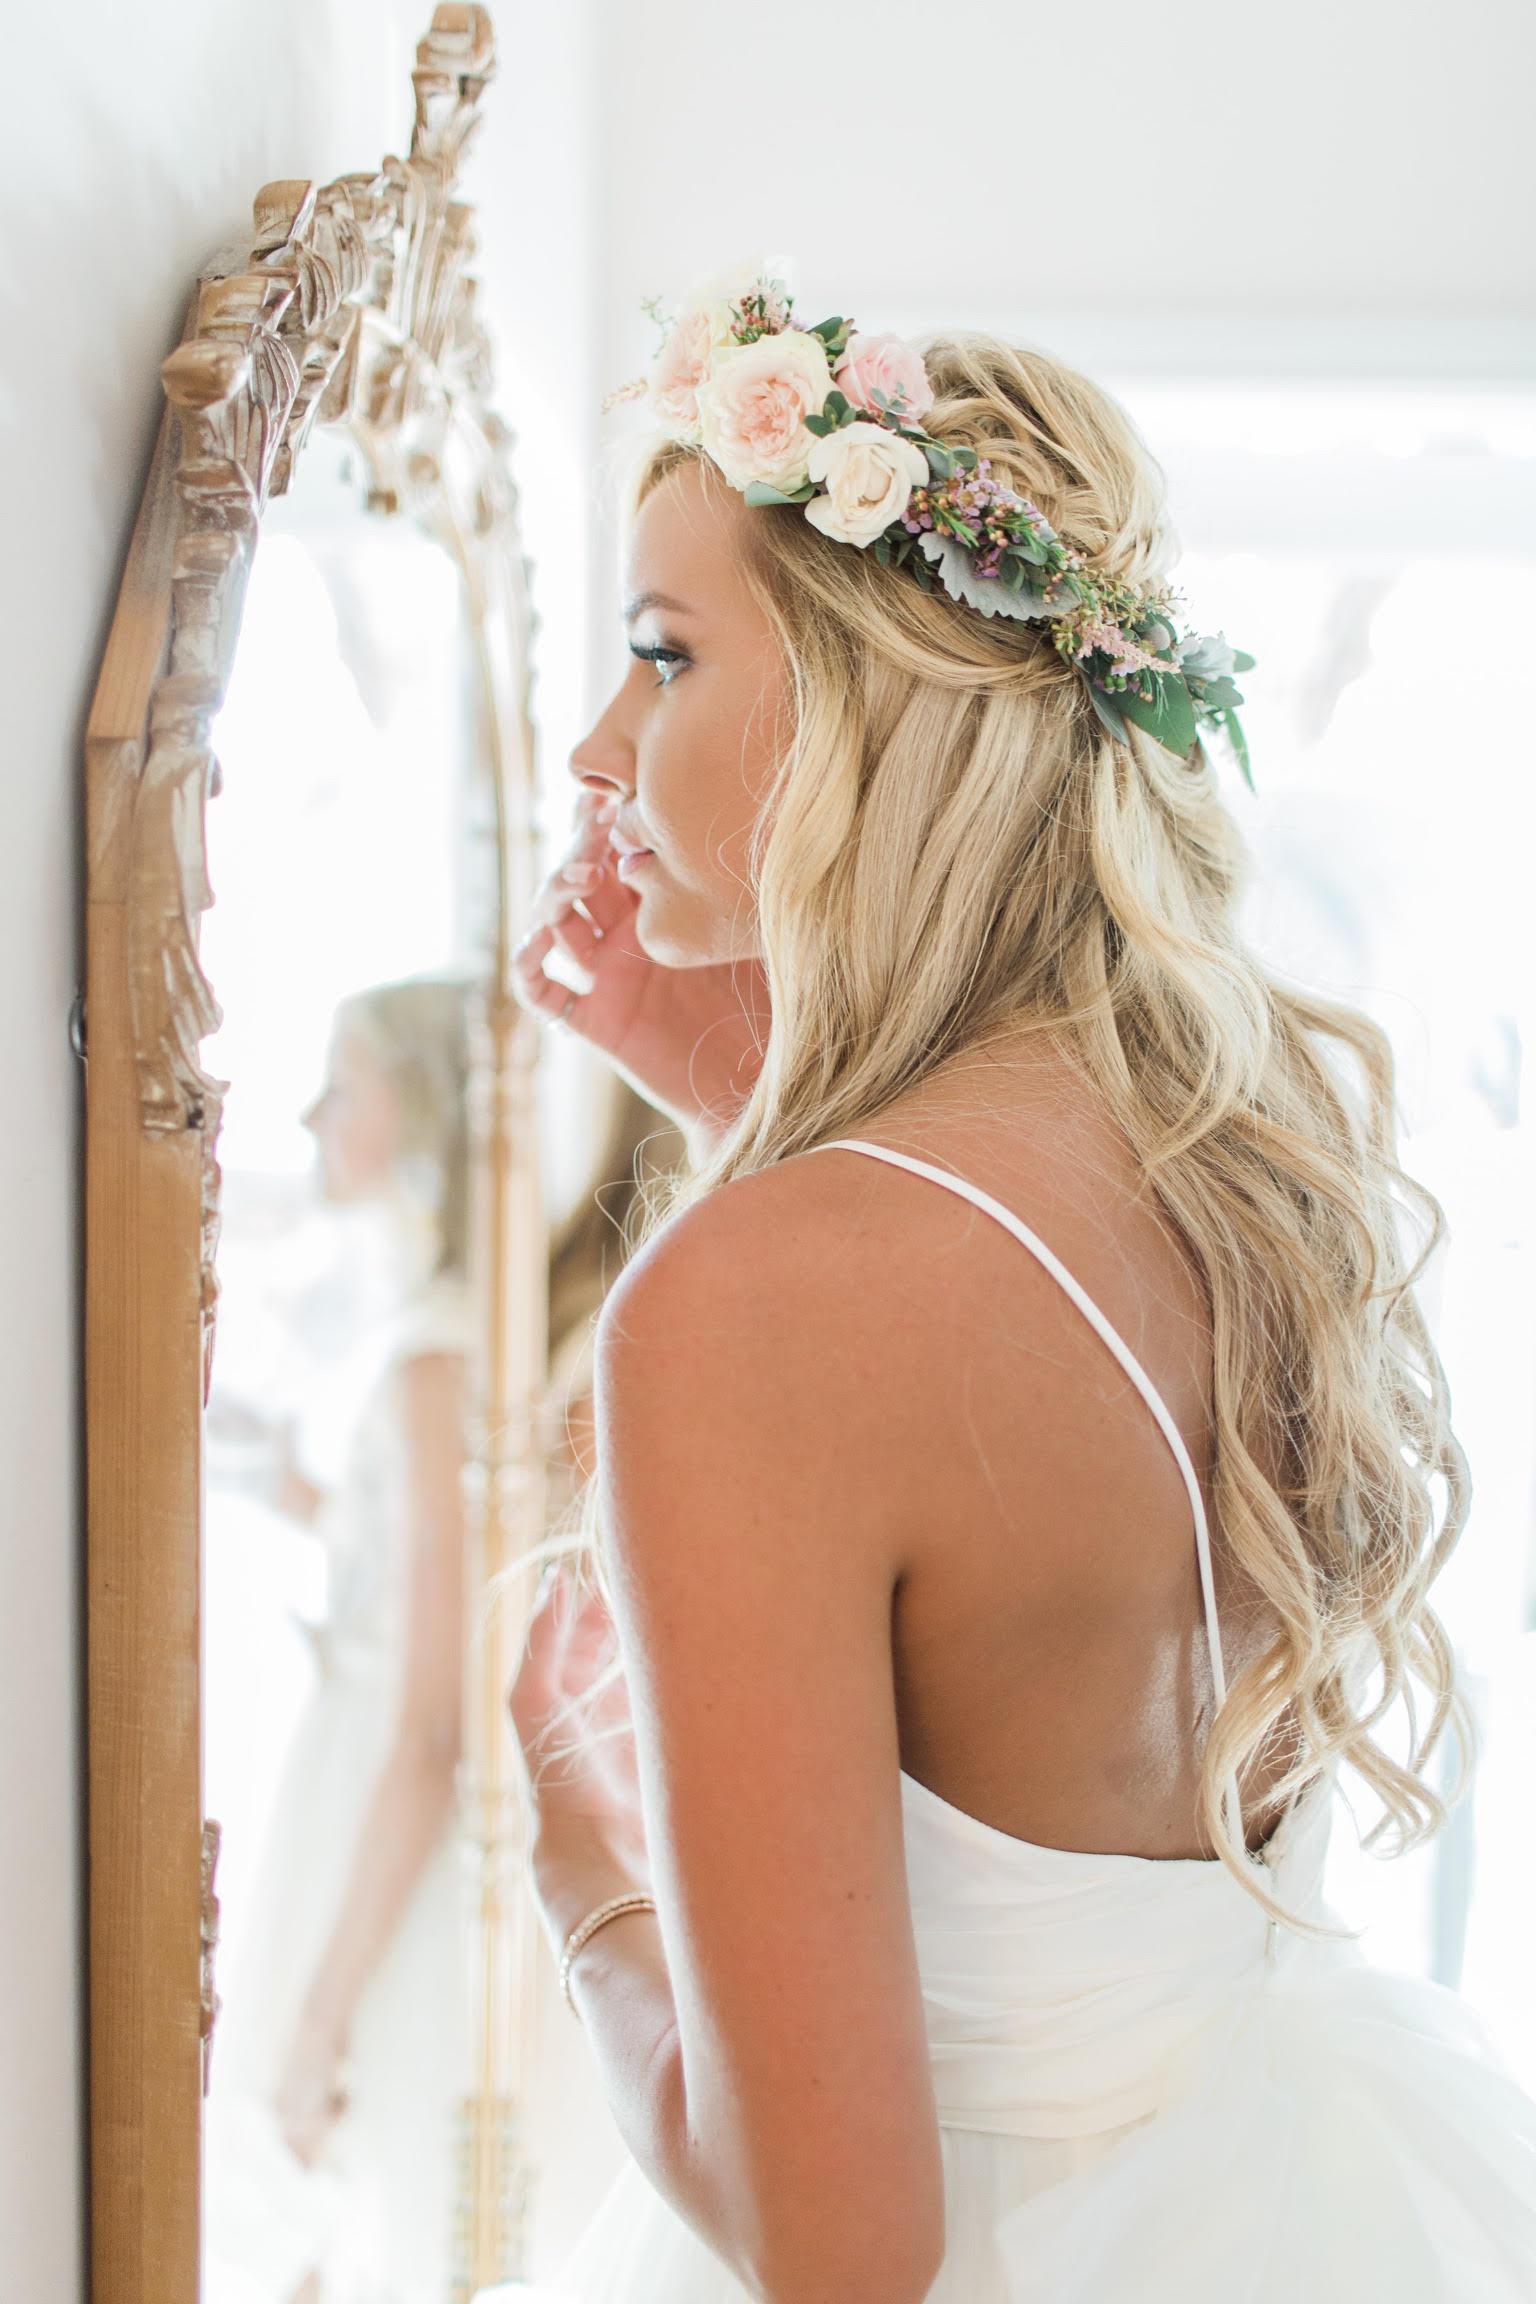 Orange_County_Laguna_Beach_Wedding_Hair_Makeup.jpg